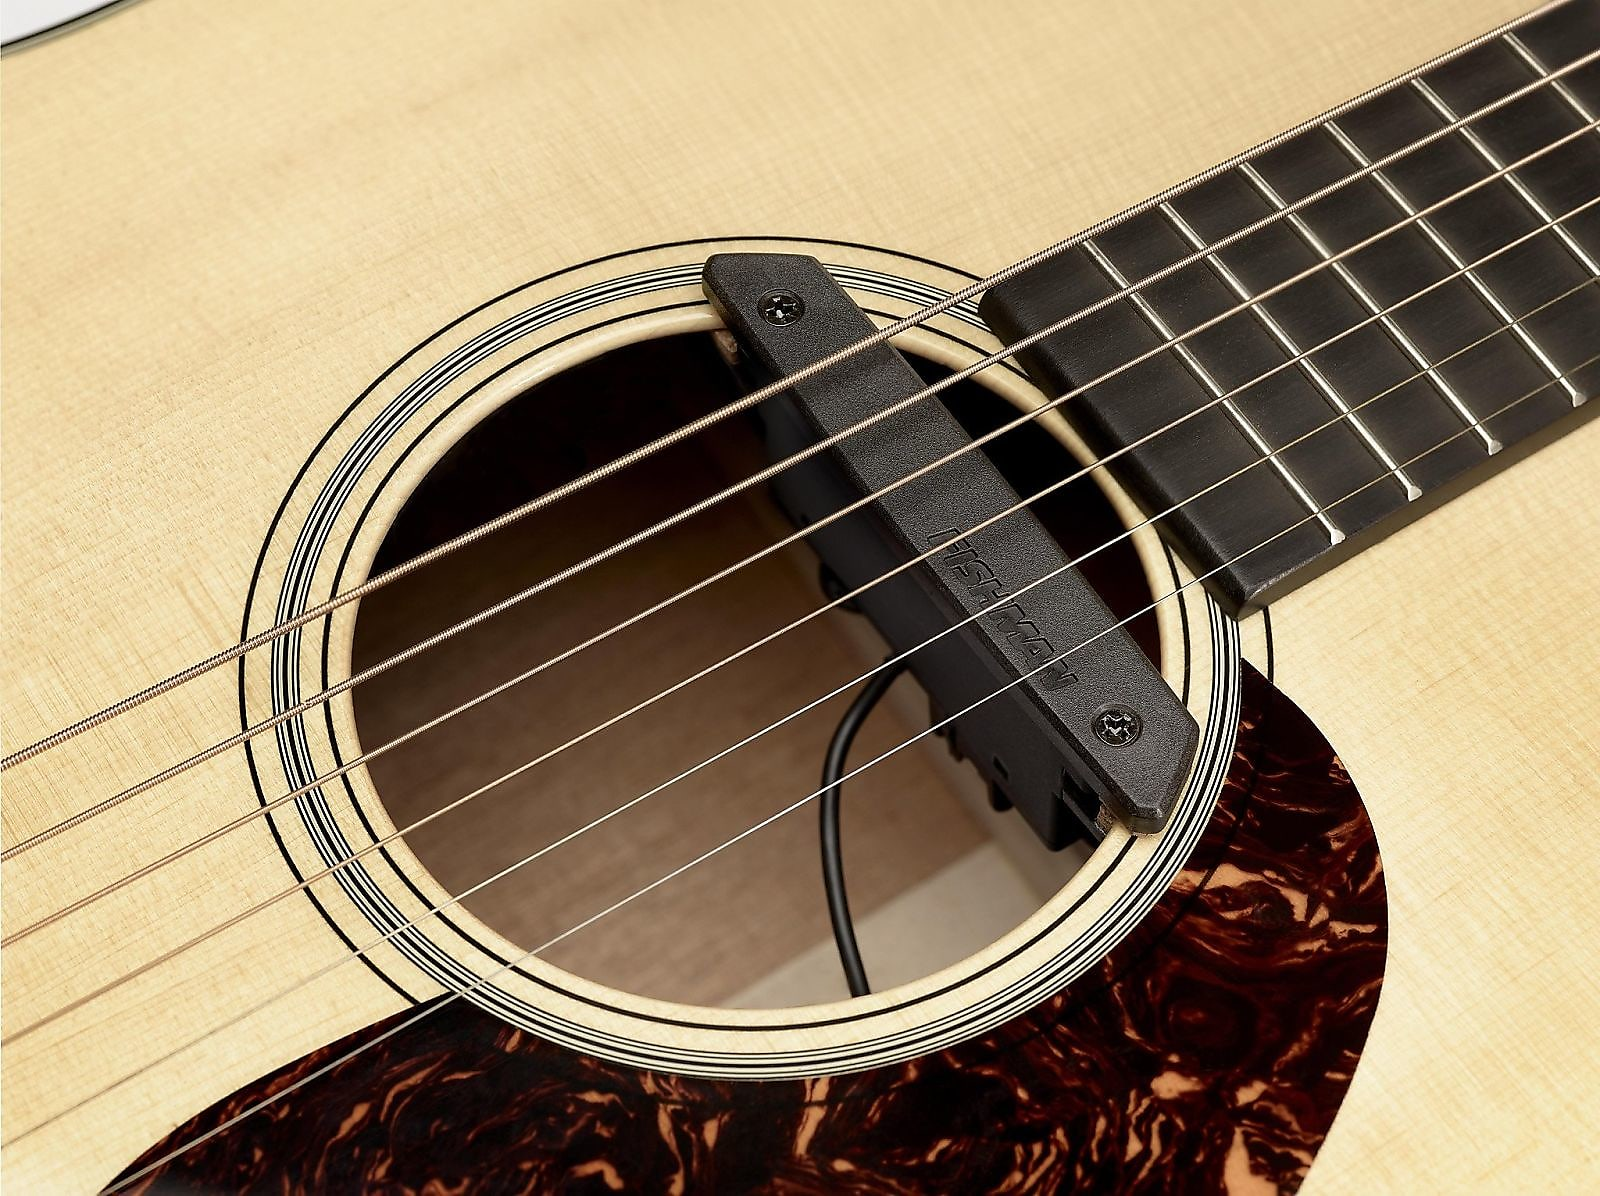 Fishman PRO-REP-102 Rare Earth Humbucking Active Acoustic Guitar Soundhole Pickup